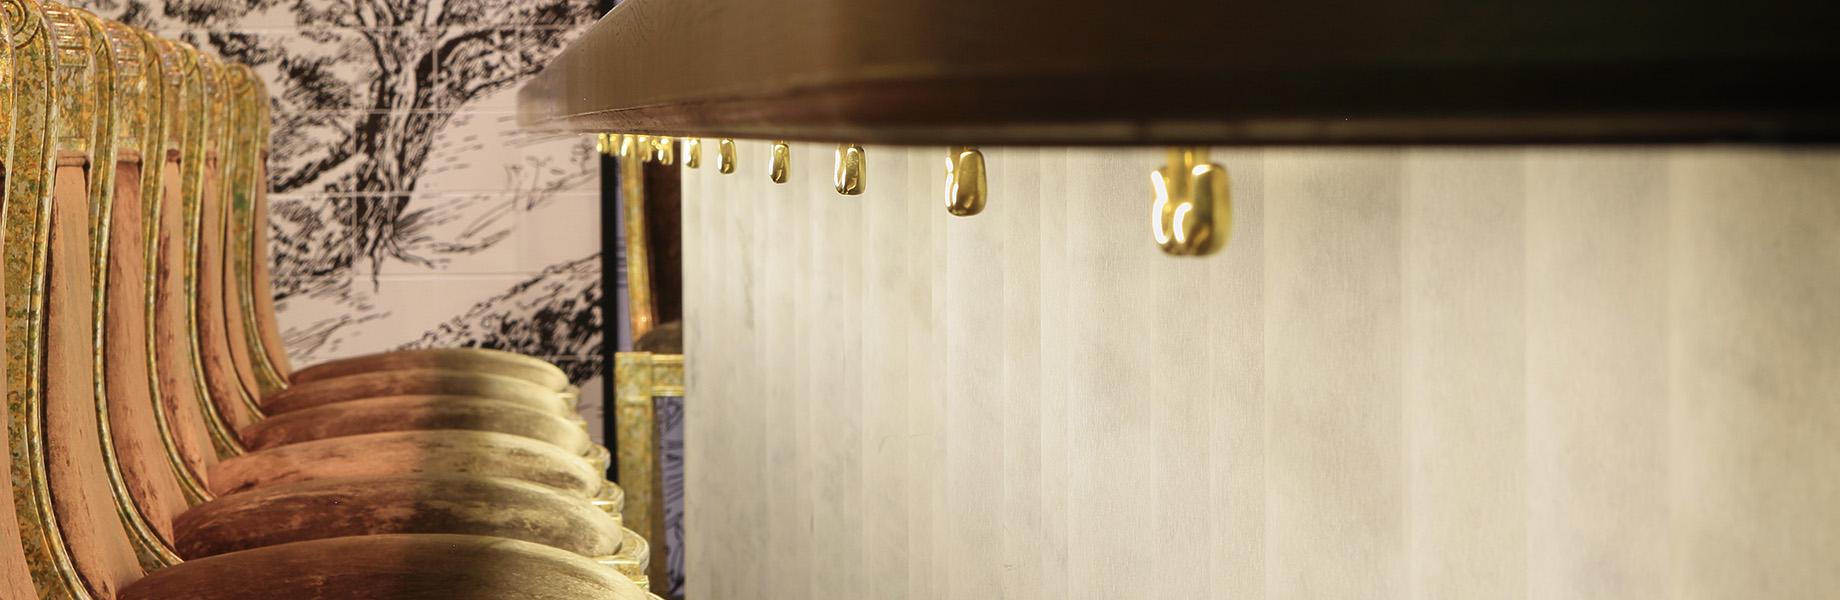 LithosDesign_aaltos_marble restaurant design_with_chiffon_stone_wall_texture